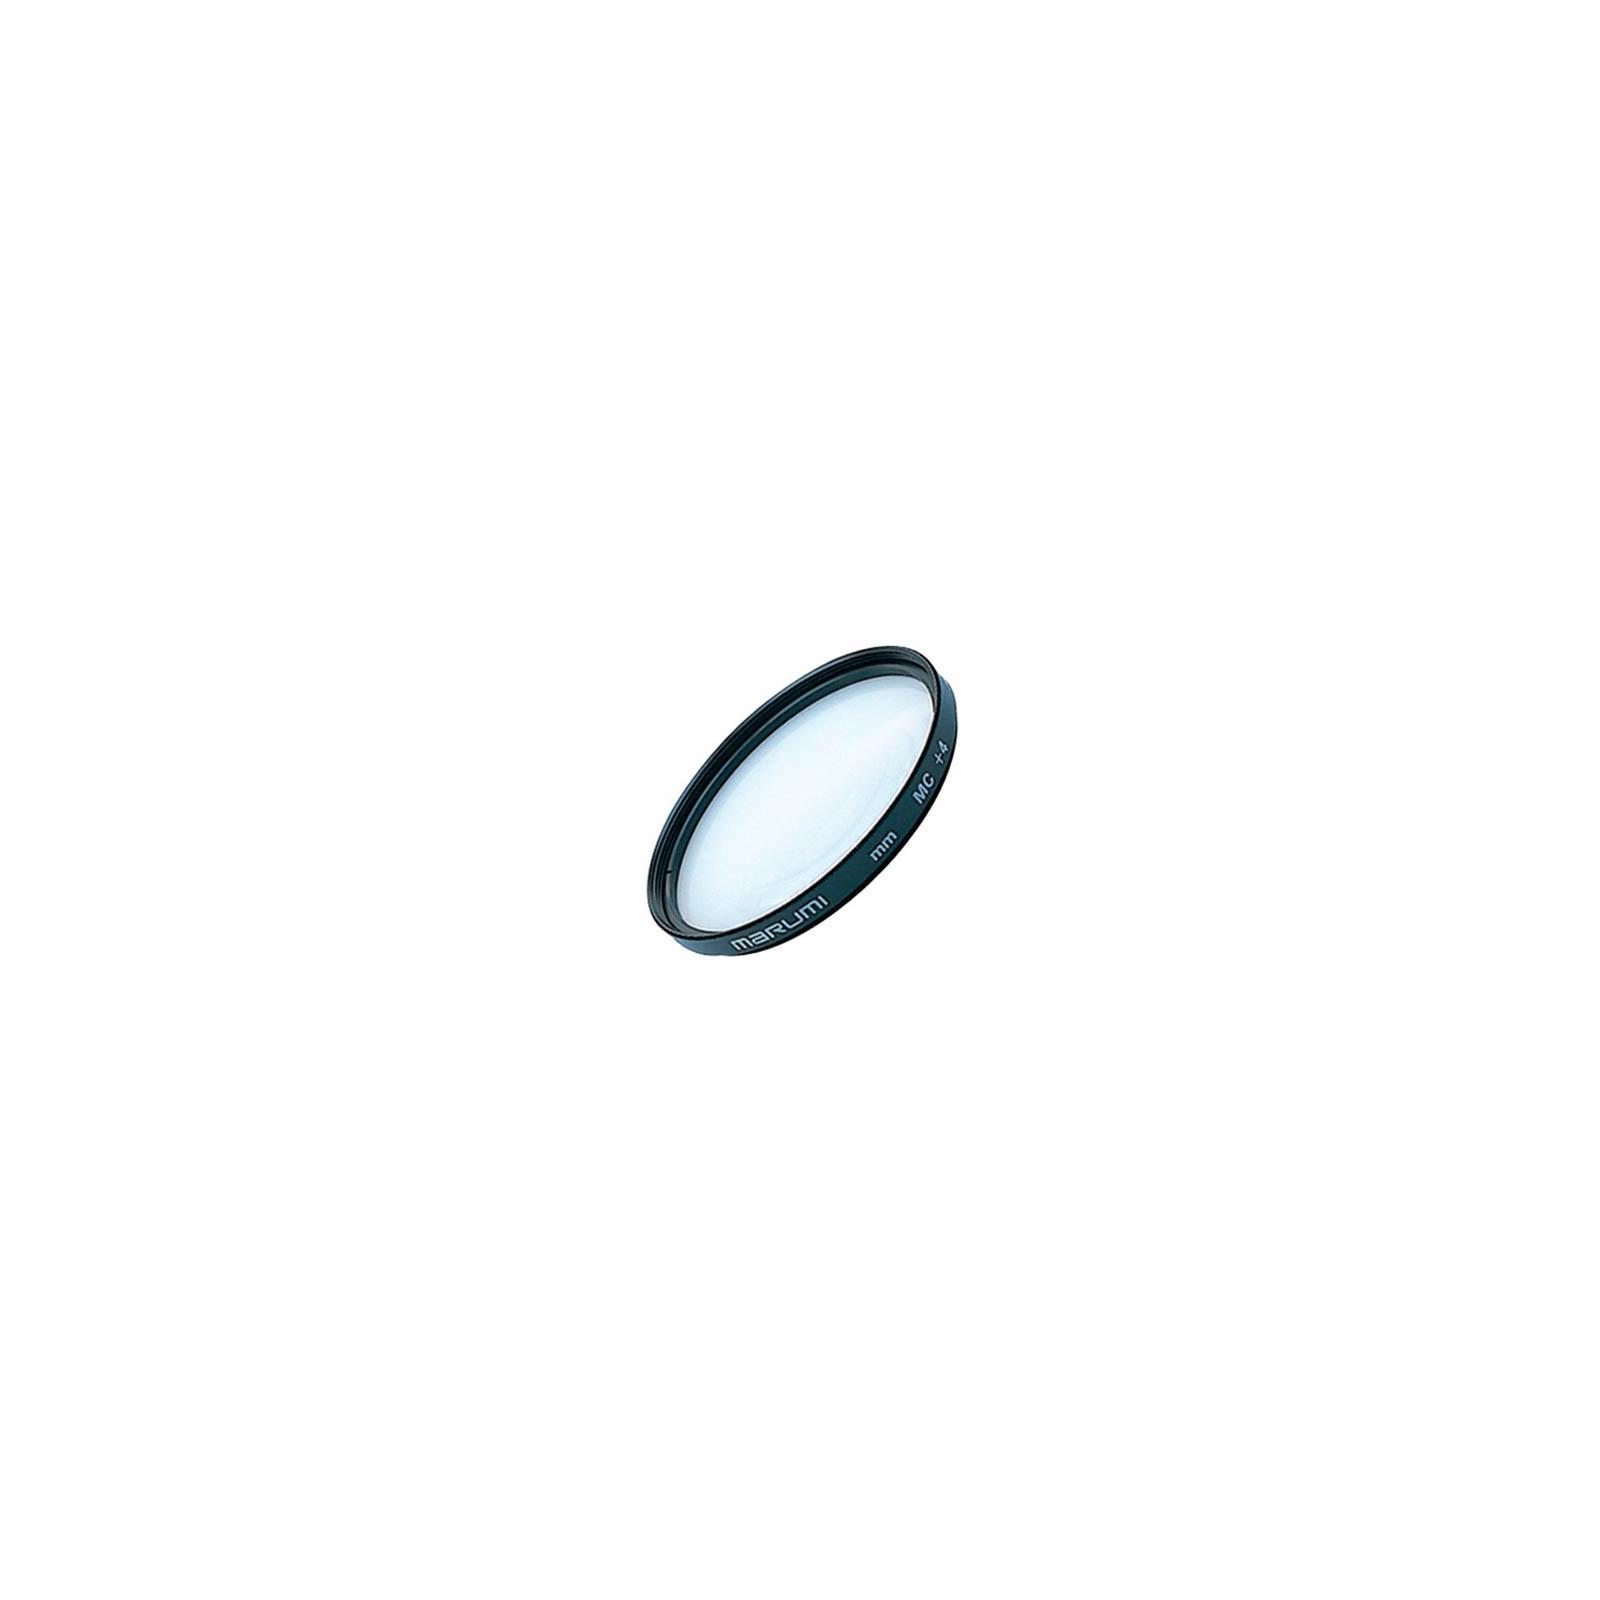 Светофильтр Marumi Close-up+4 62mm